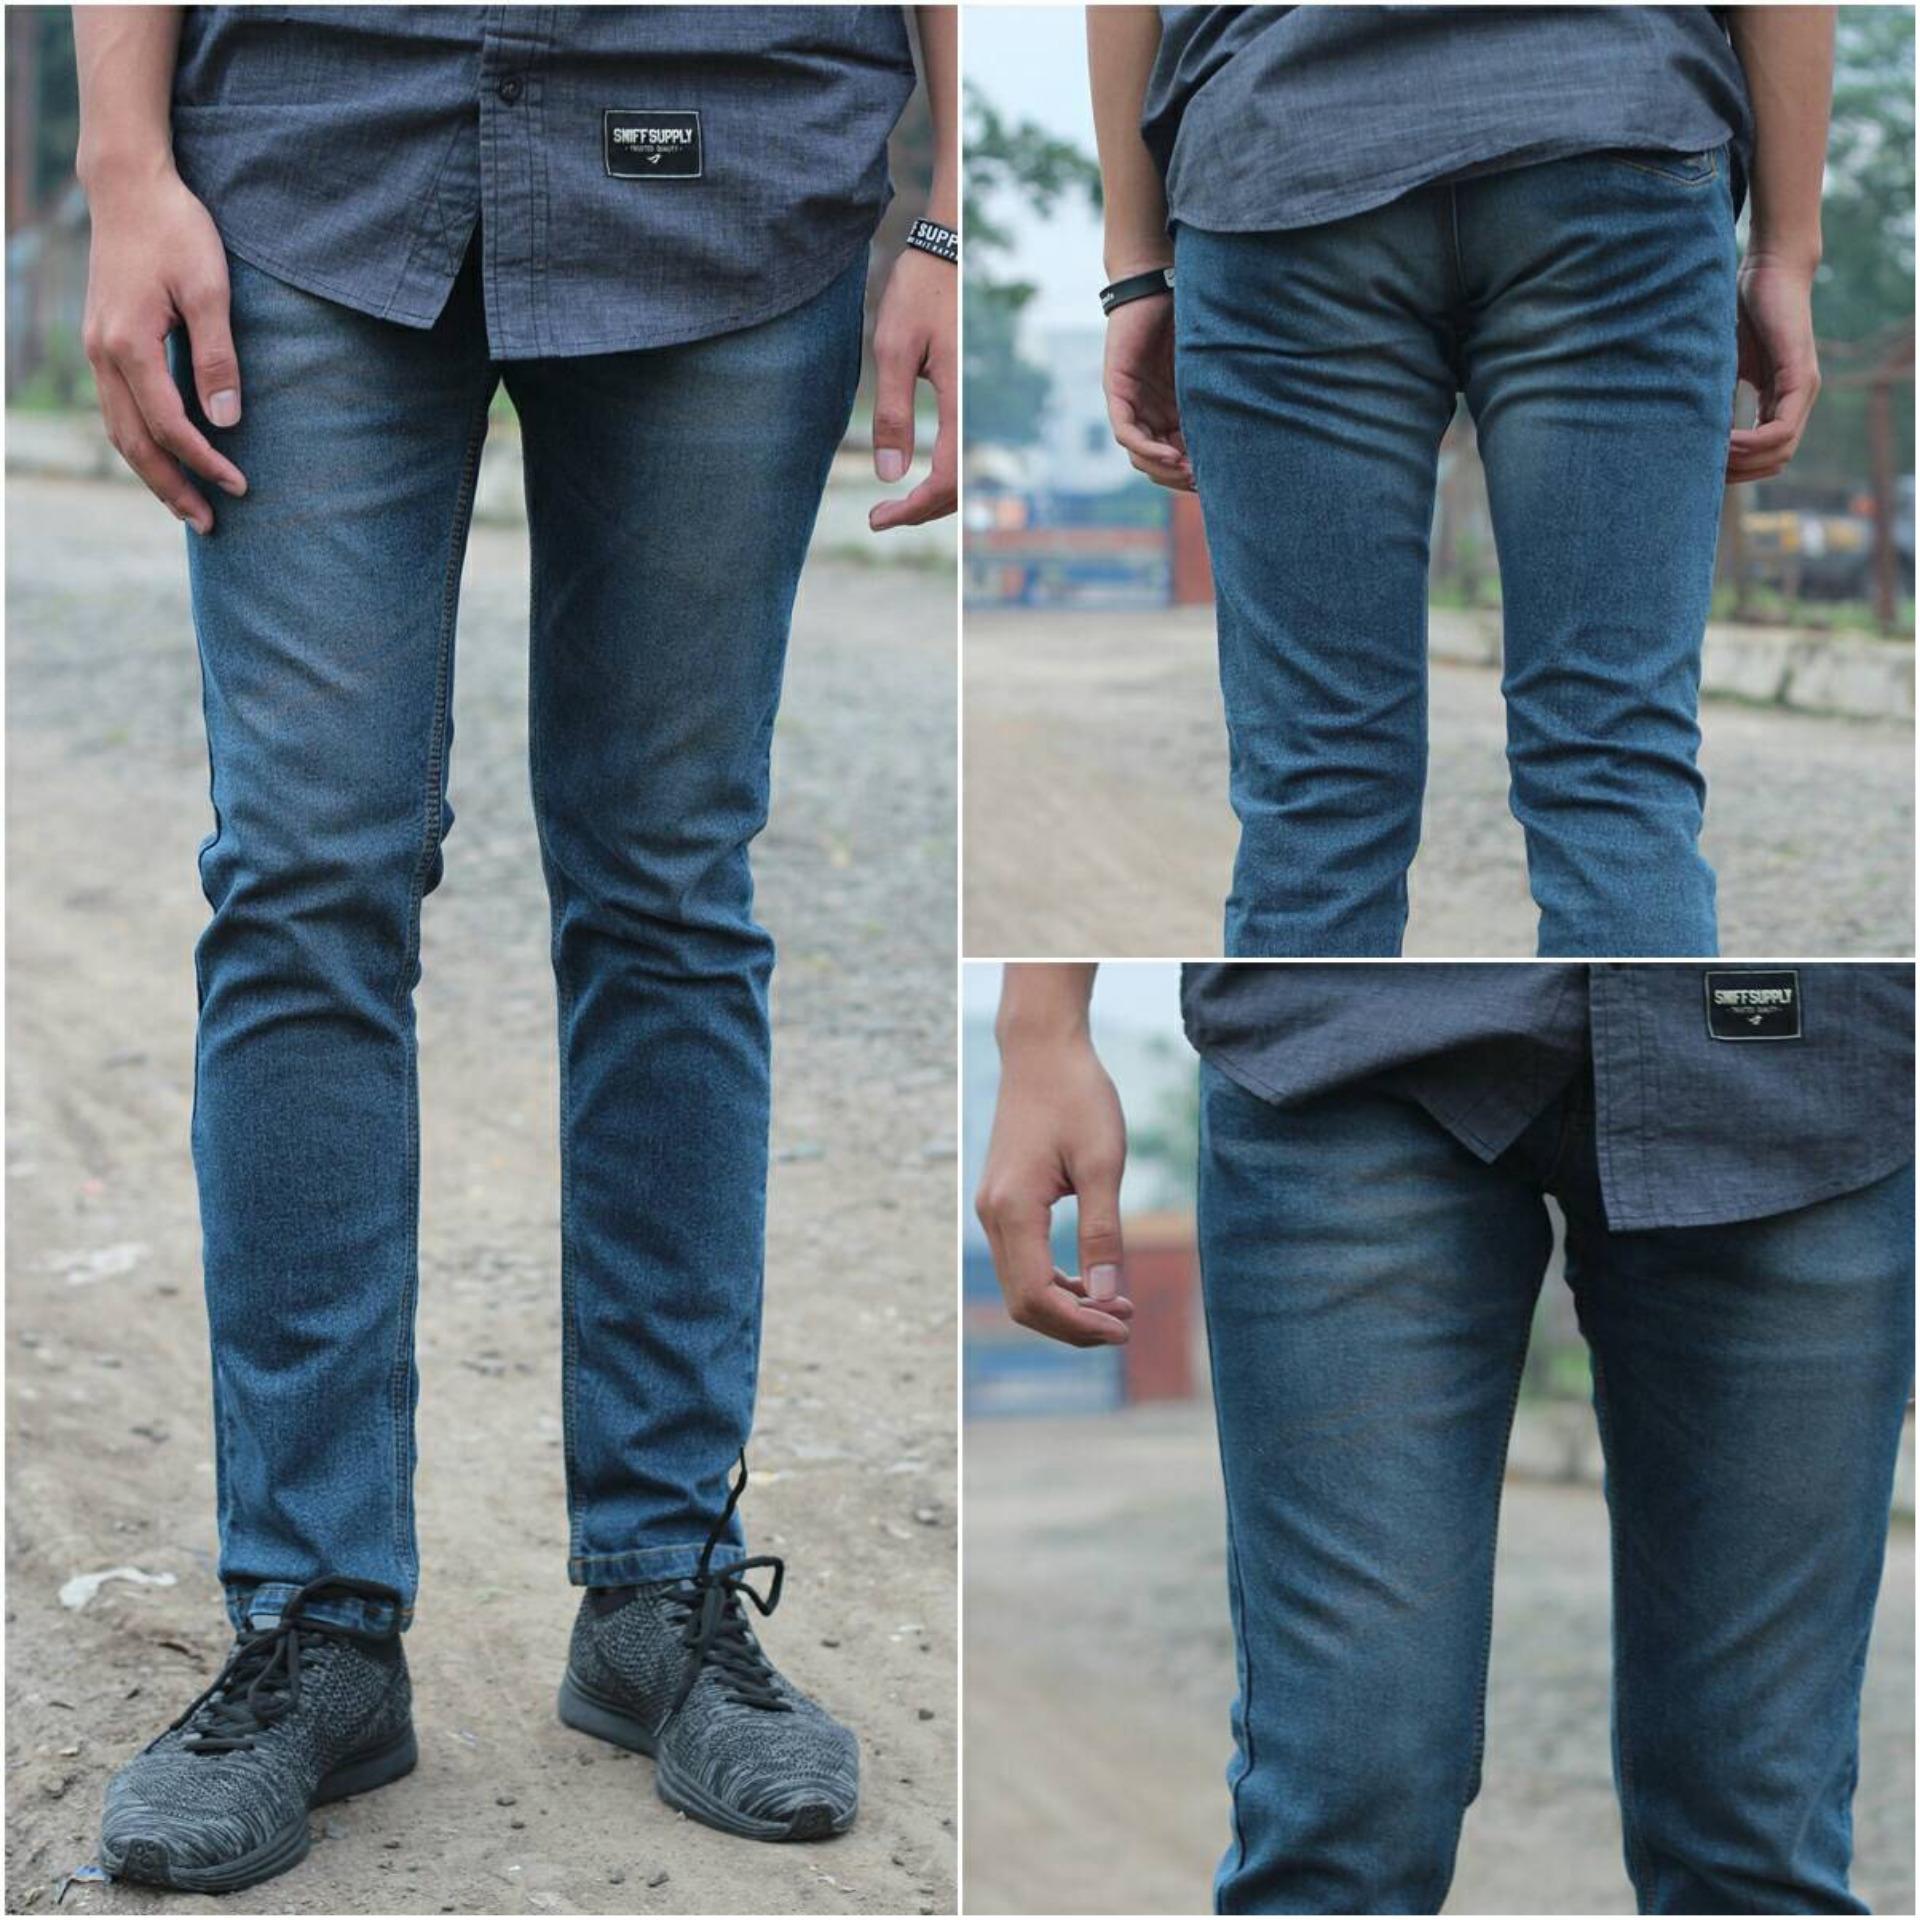 Celana PANJANG Jeans Slimfit Pria - Denim Stretch - Jeans Pensil Melar  - DARK BLUE